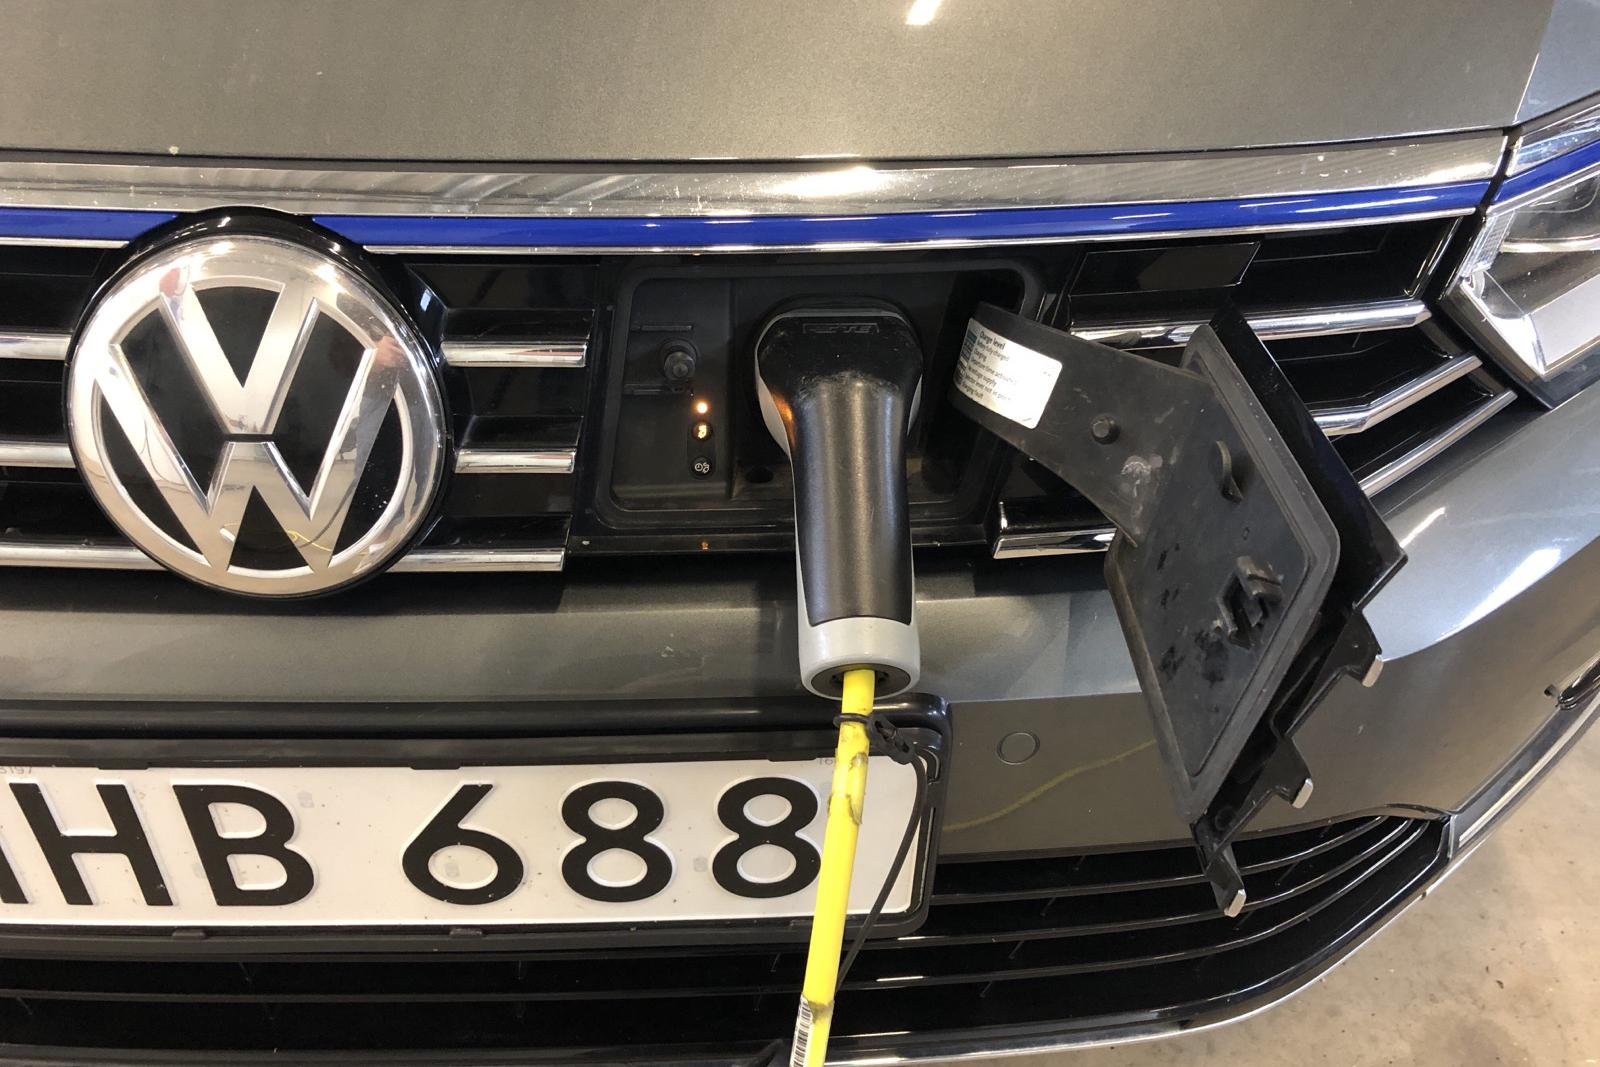 VW Passat 1.4 Plug-in-Hybrid Sportscombi (218hk) - 95 740 km - Automatic - Dark Grey - 2016